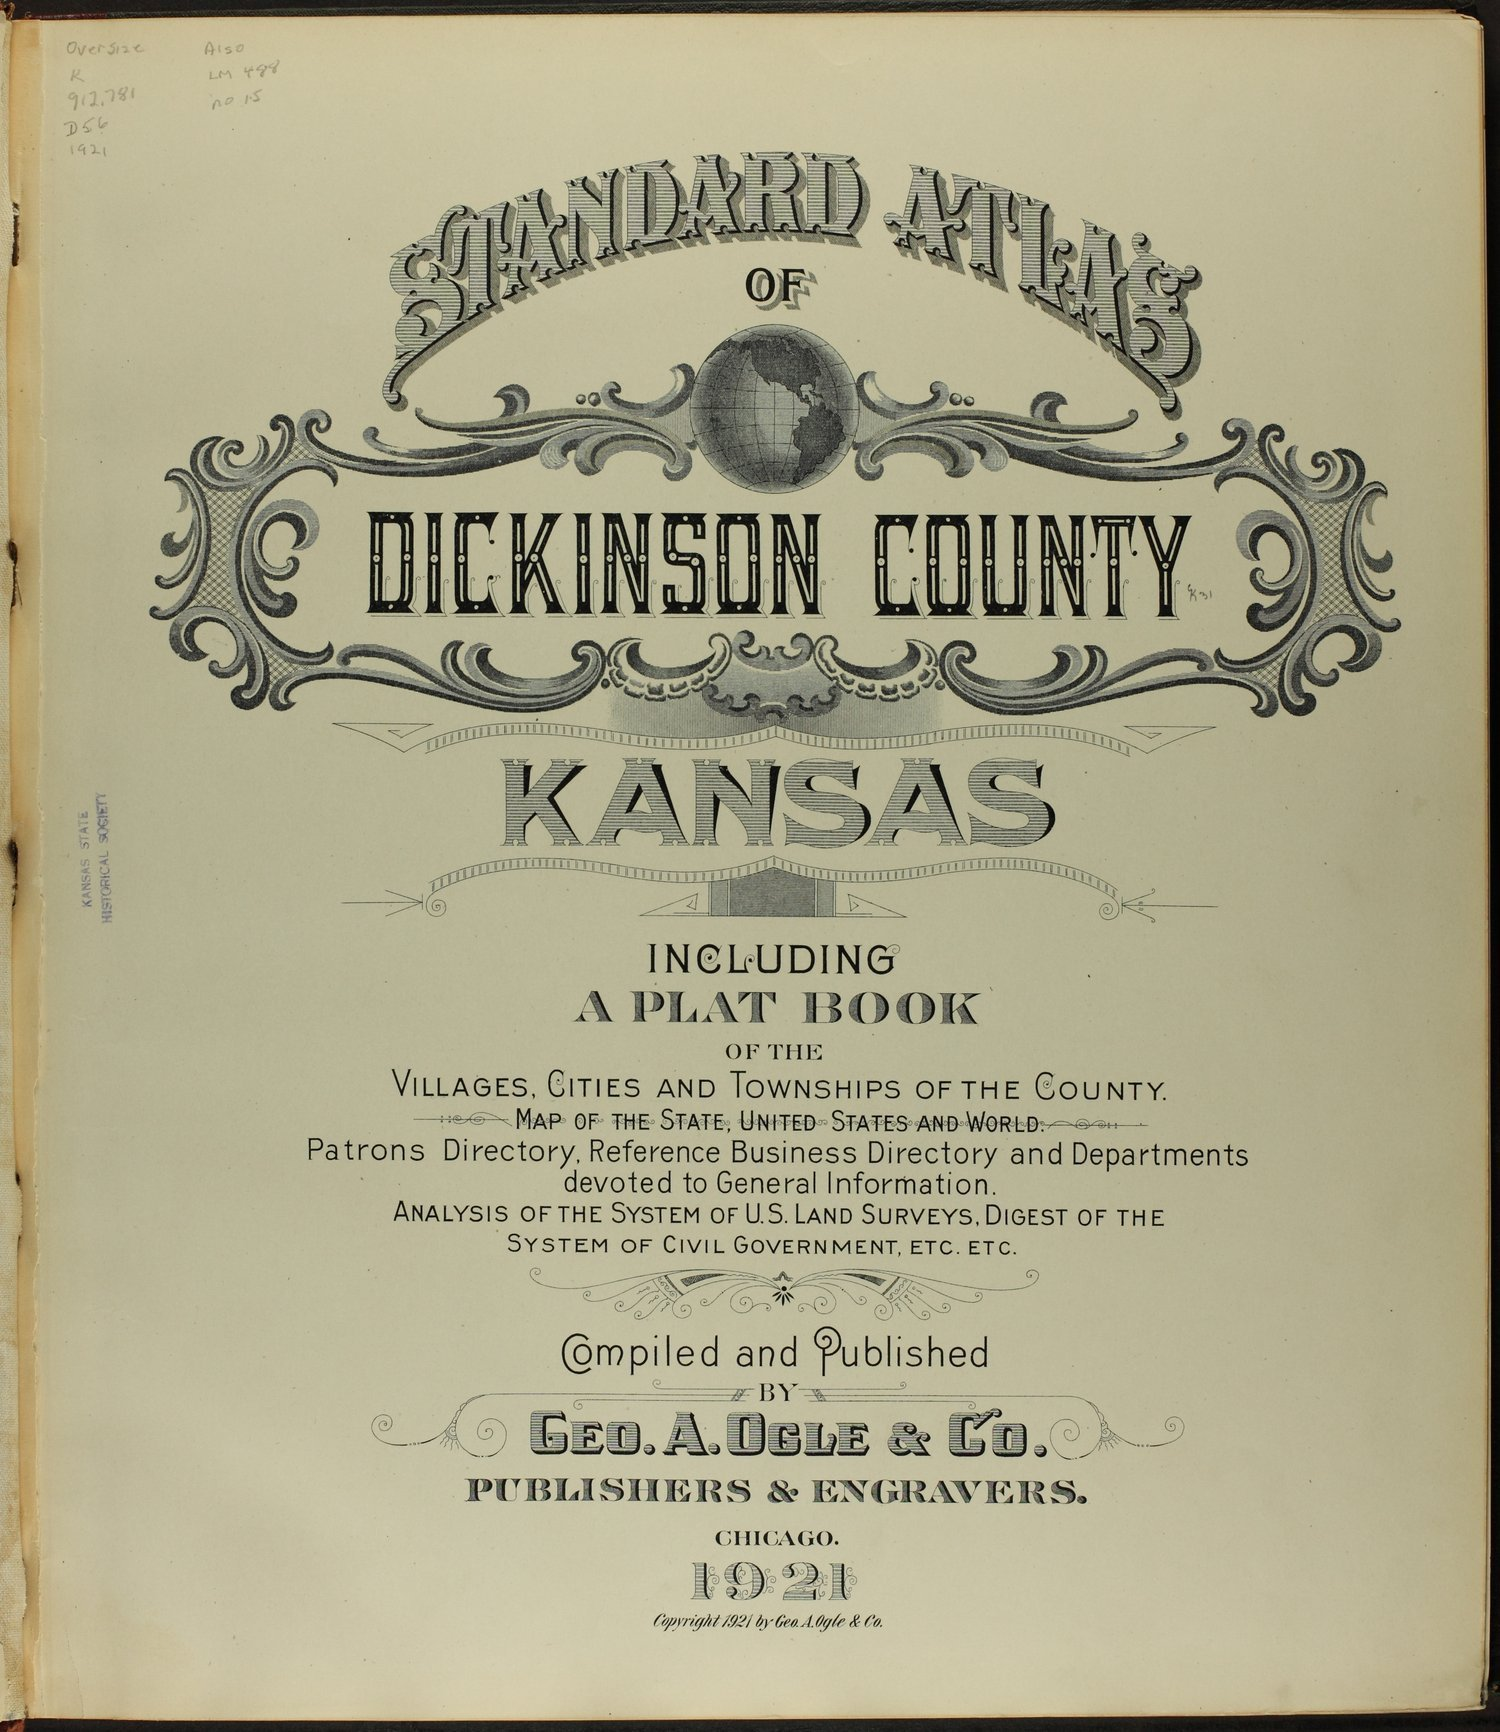 Standard atlas of Dickinson County, Kansas - Title Page